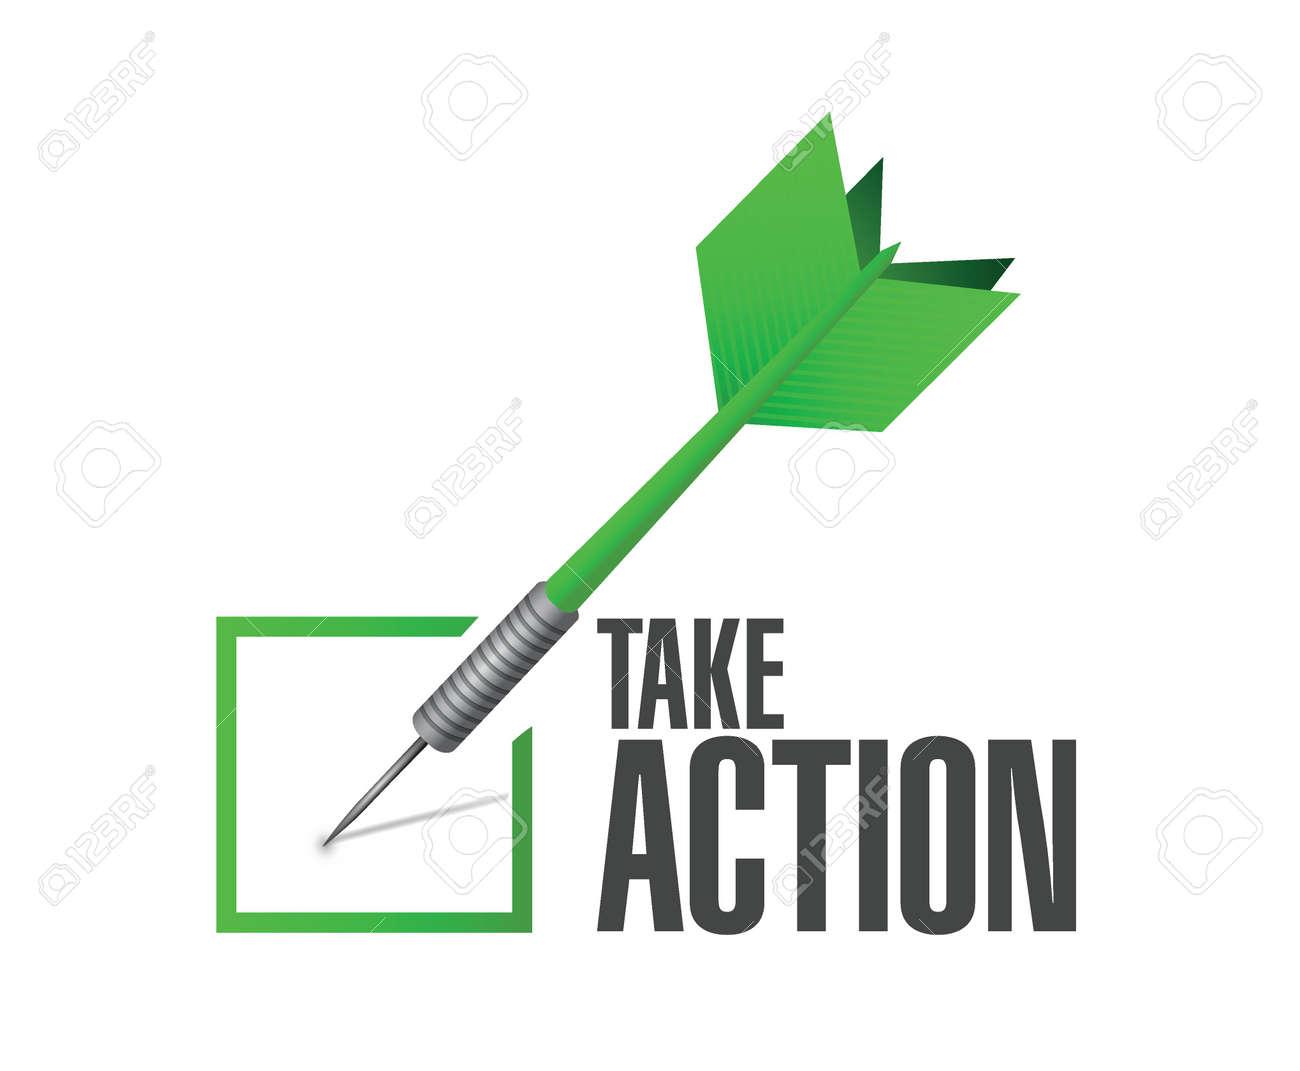 take action check dart sign illustration design over a white background - 36658782